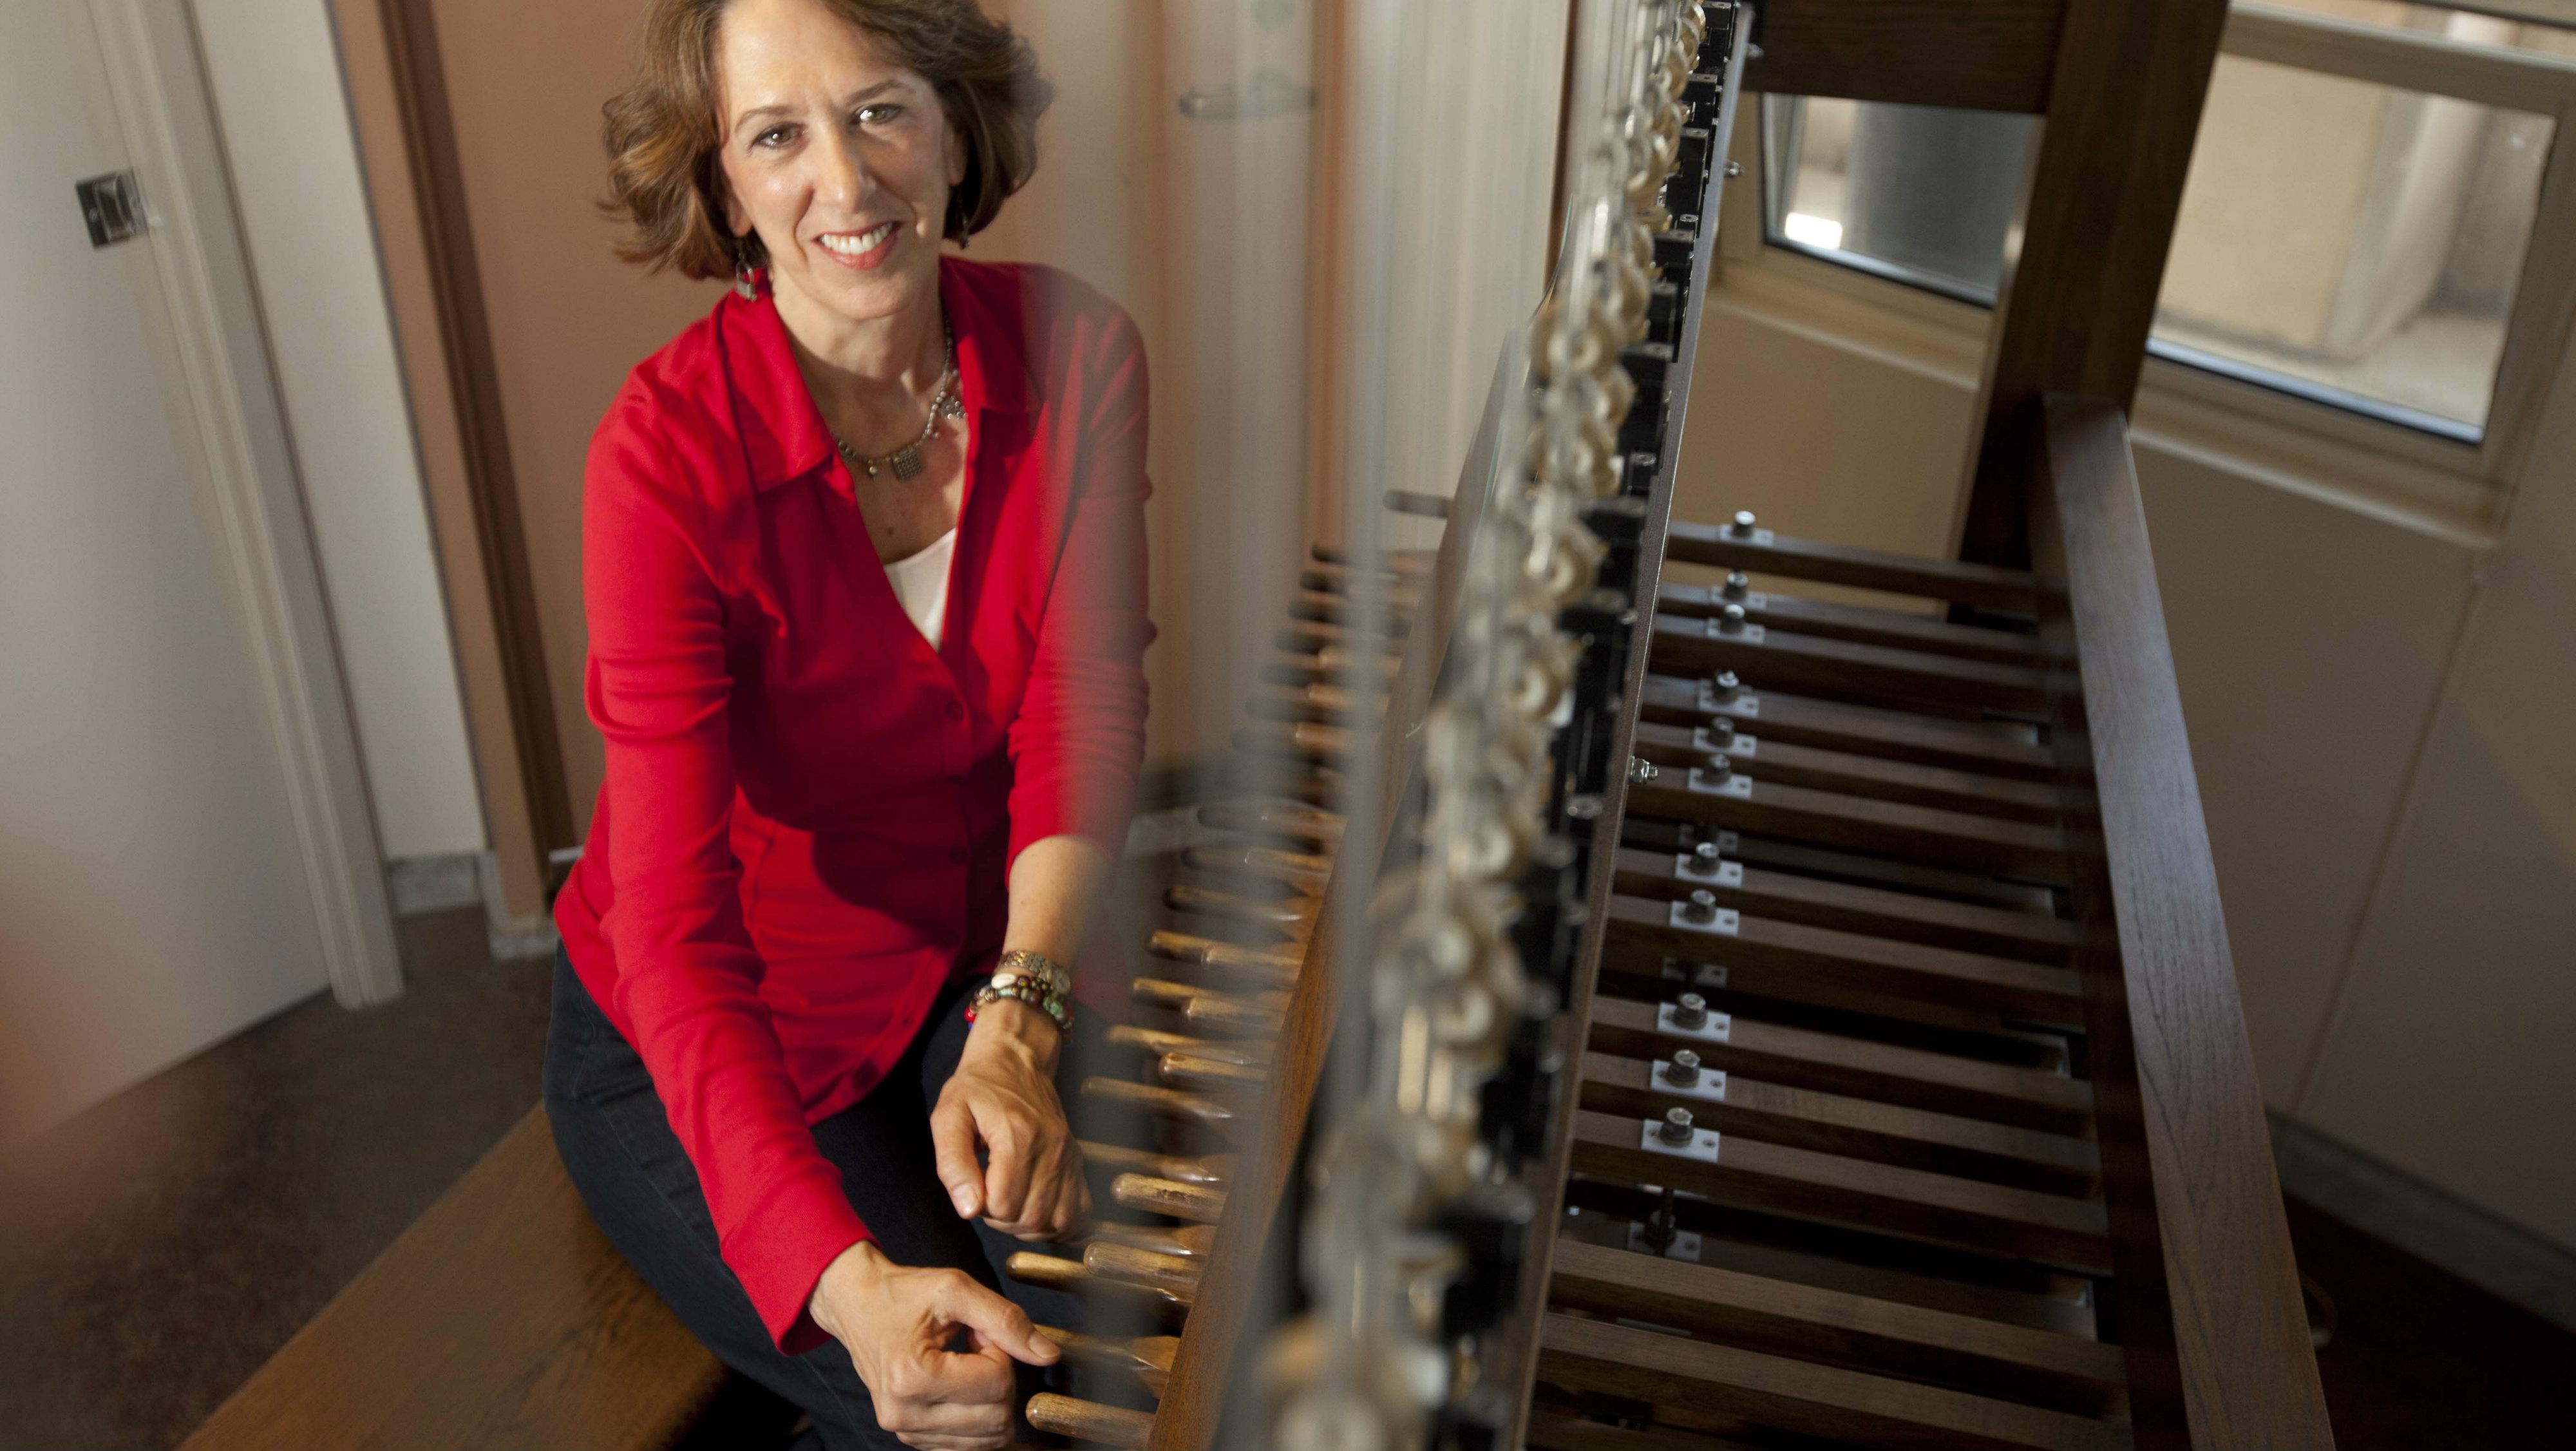 Photo: DU instructor and carillon player Carol Jickling Lens